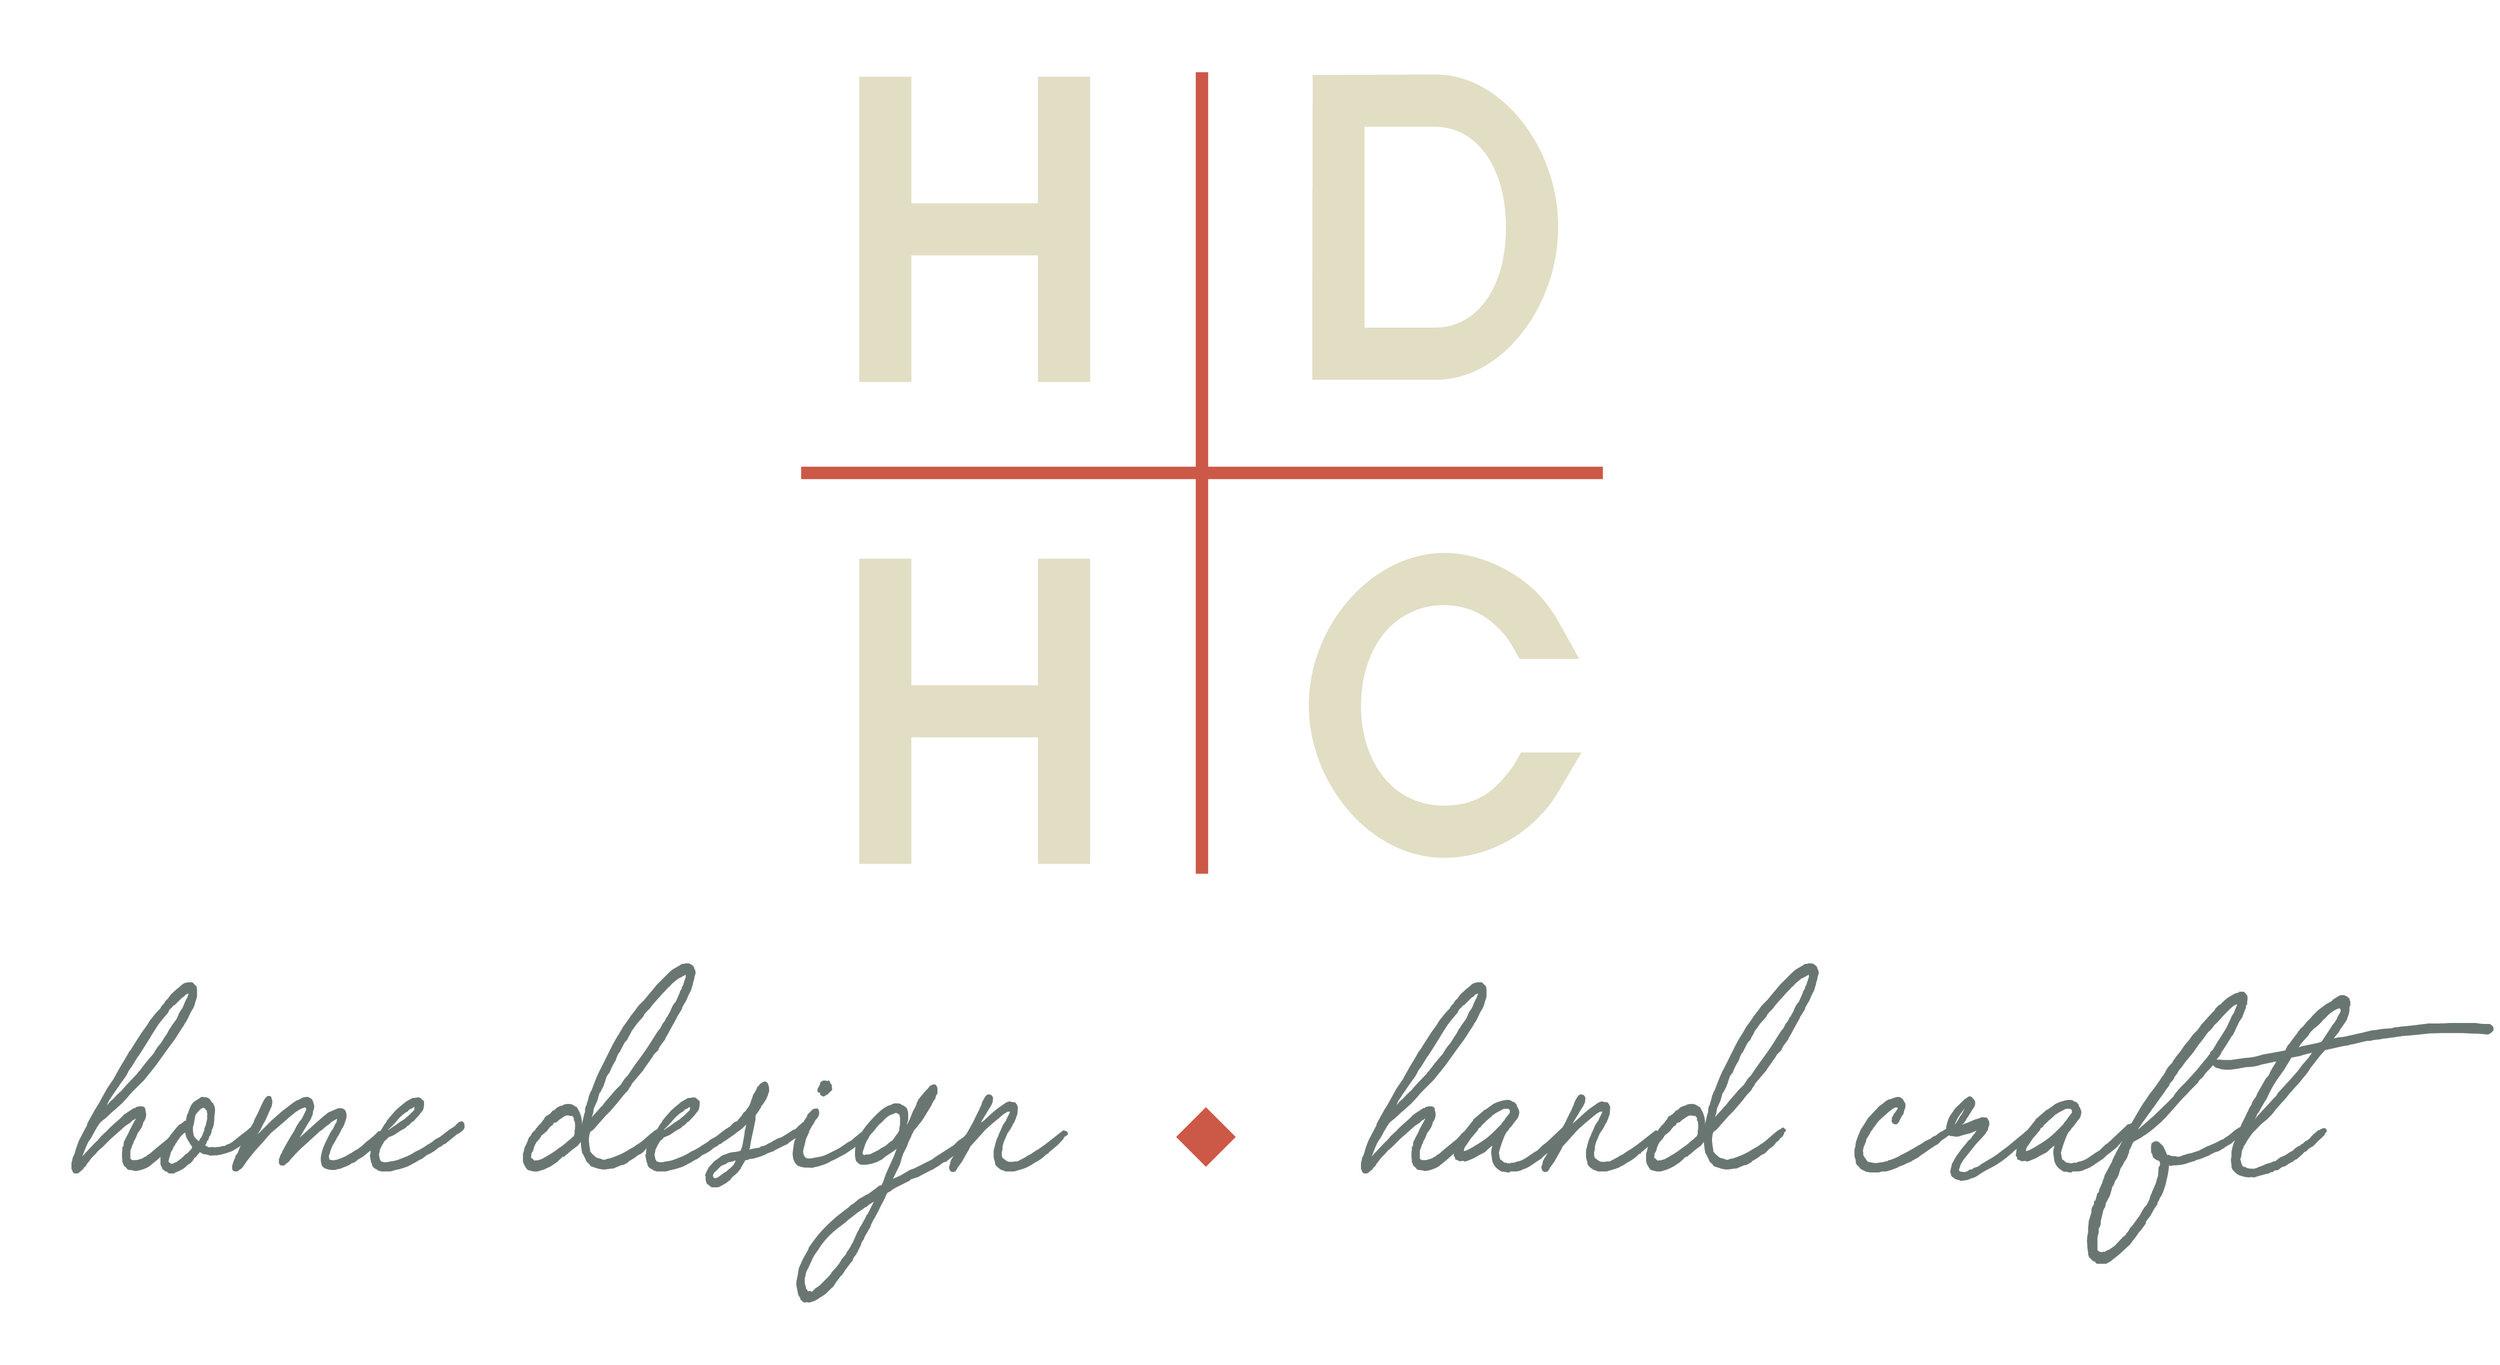 HDHC Logo 3 Color V3-01.jpg